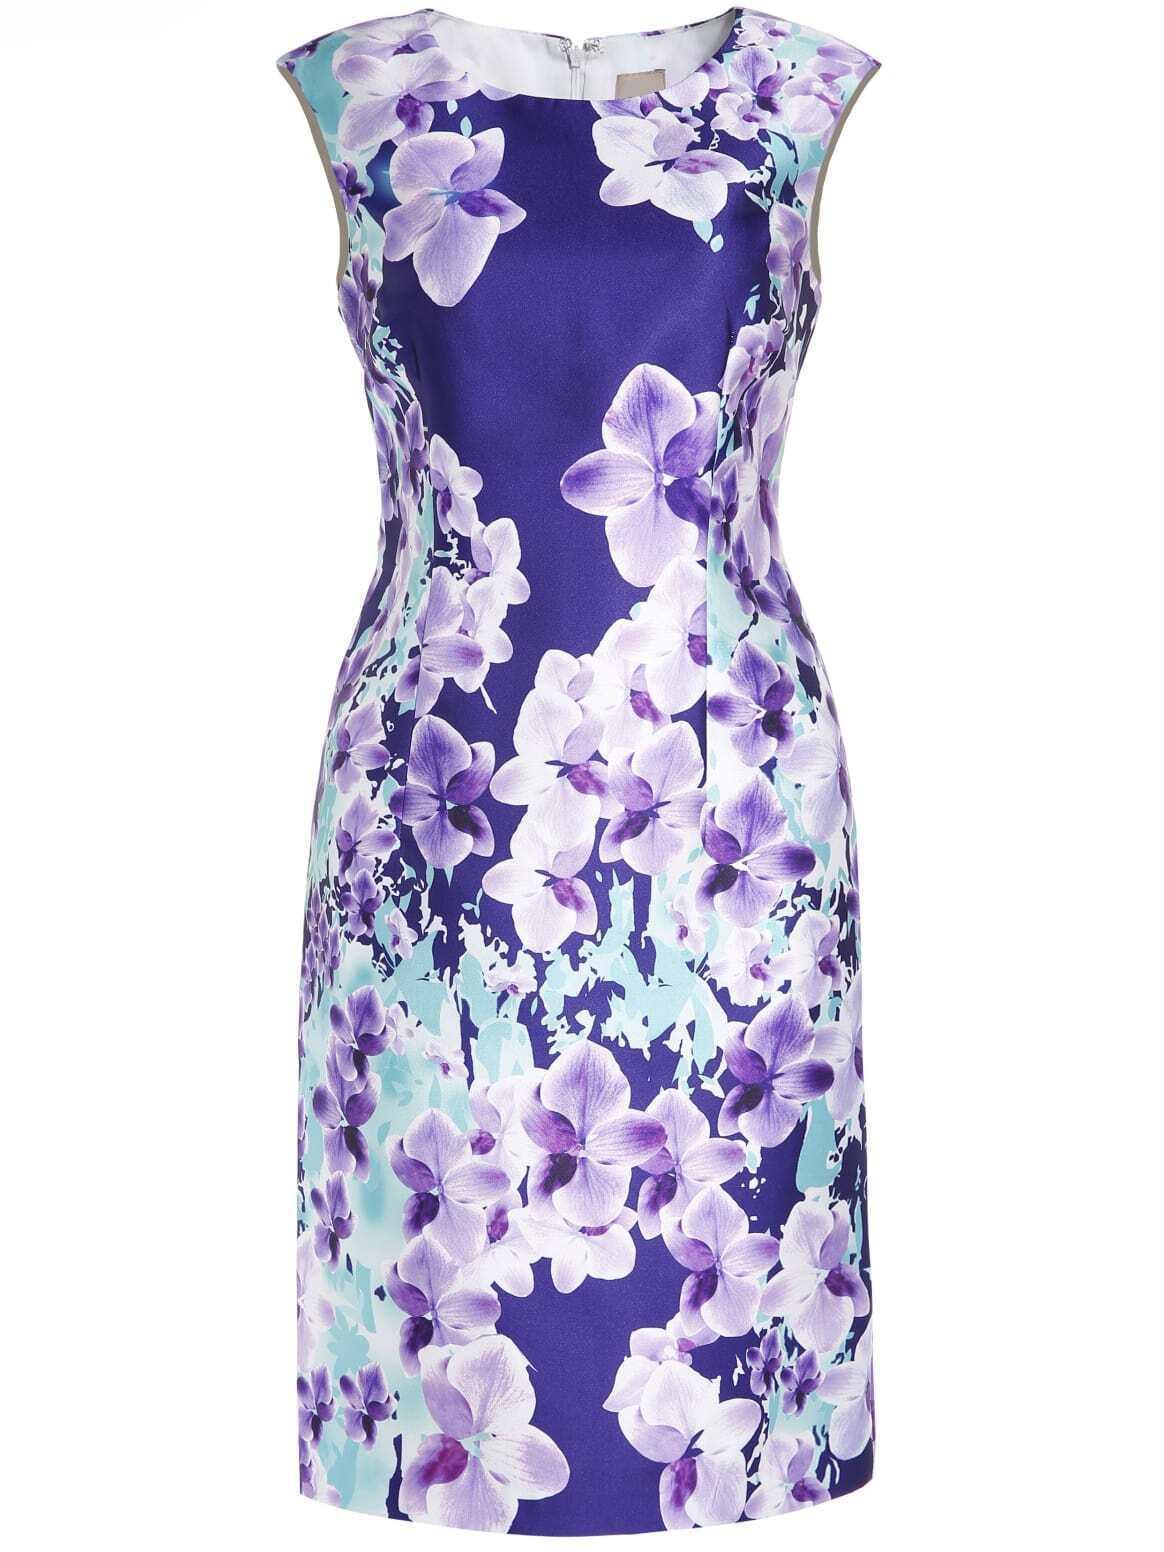 Purple Round Neck Sleeveless Floral Print Dress